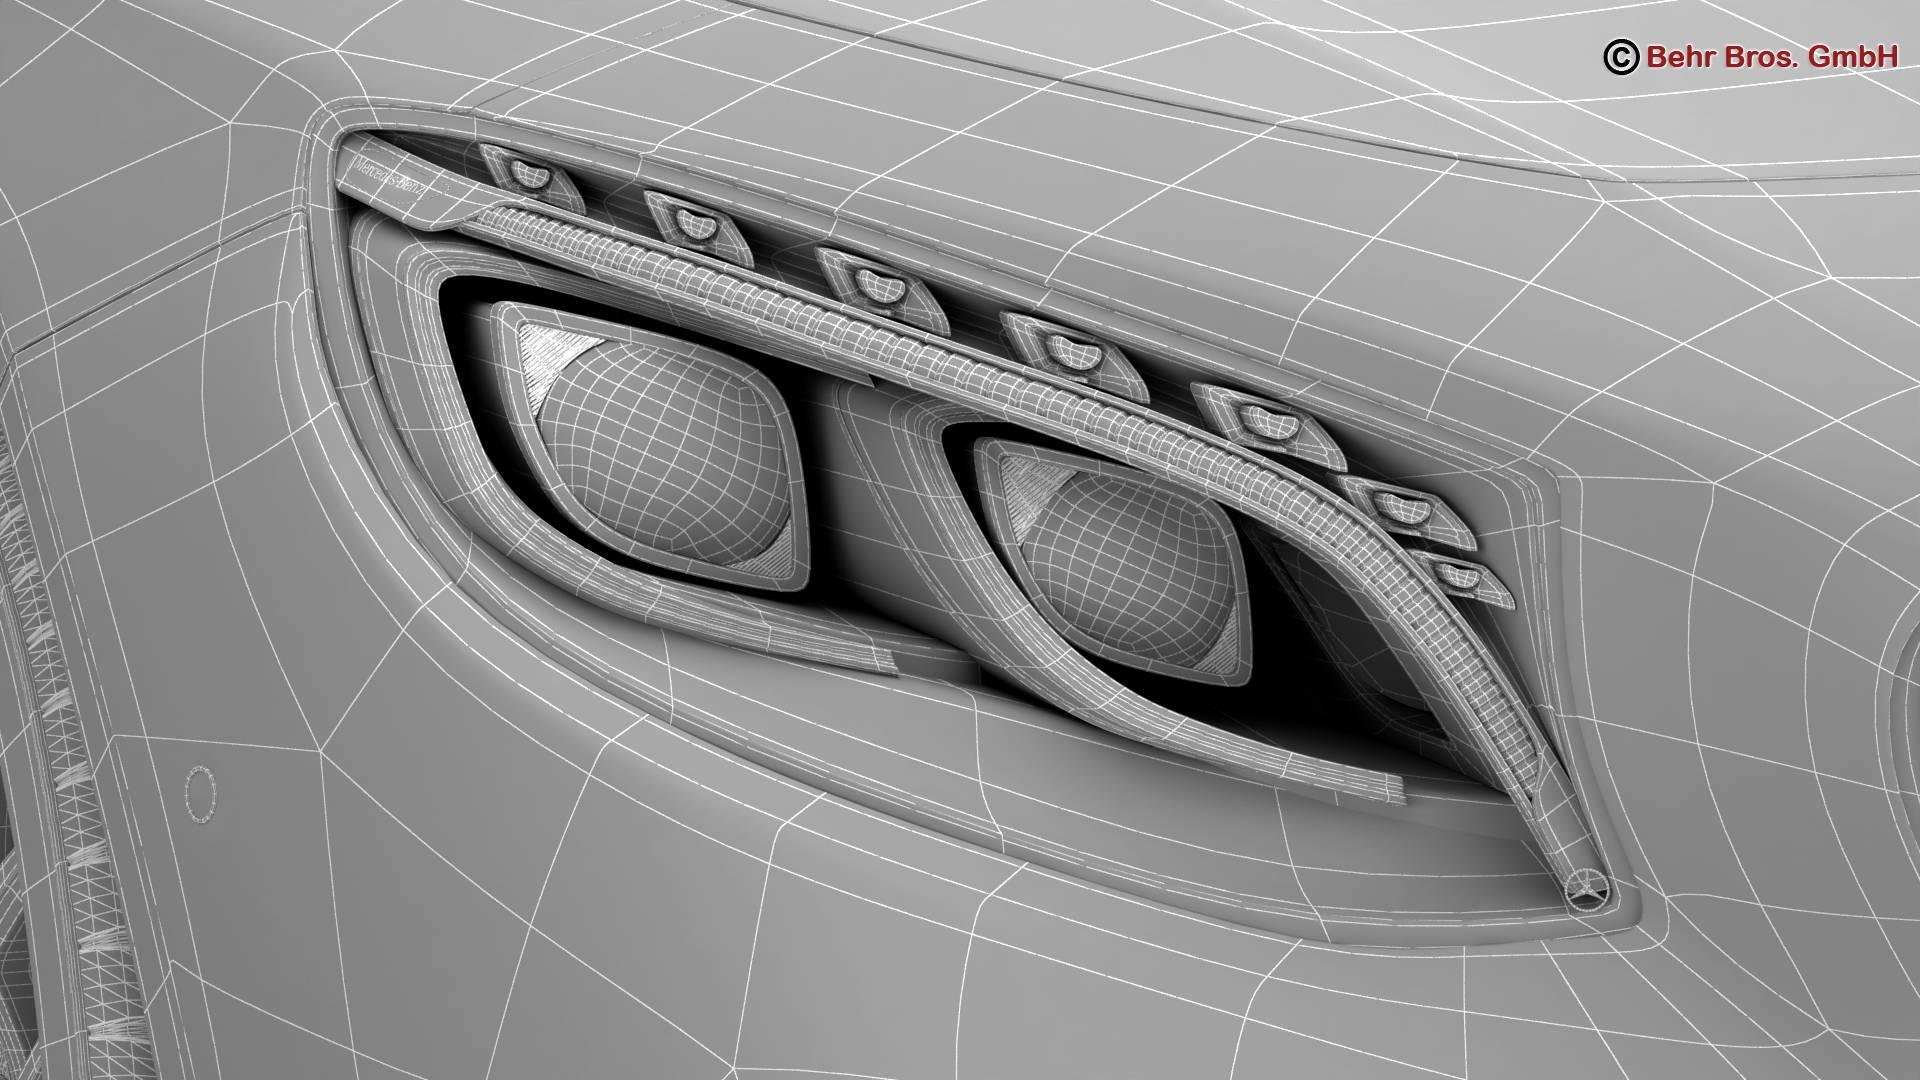 mercedes s class coupe amg s63 2018 3d model 3ds max fbx c4d lwo ma mb obj 274113